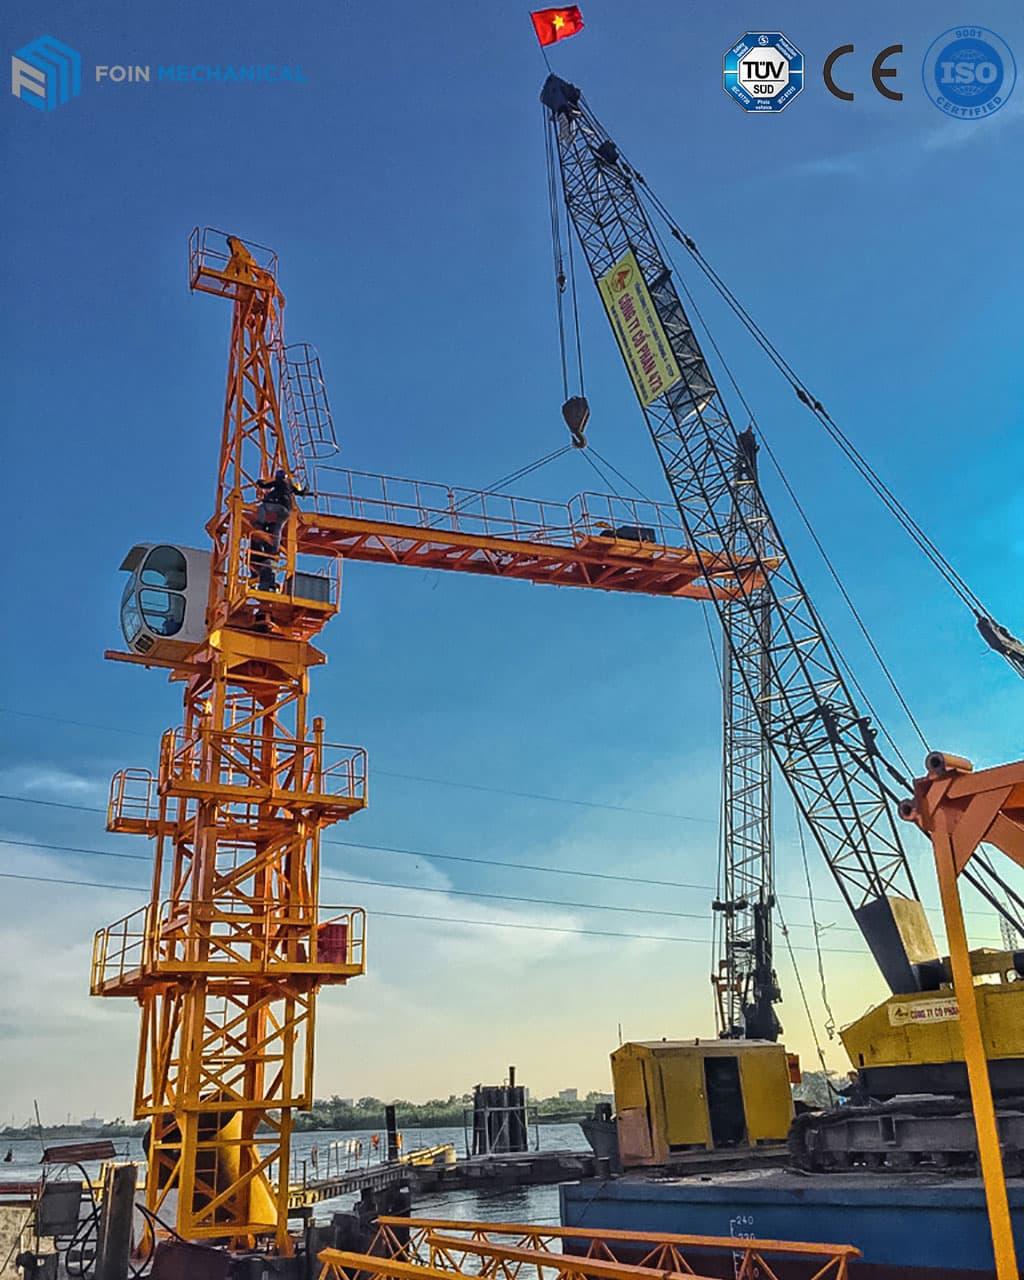 FOIN Topkit tower crane assembly